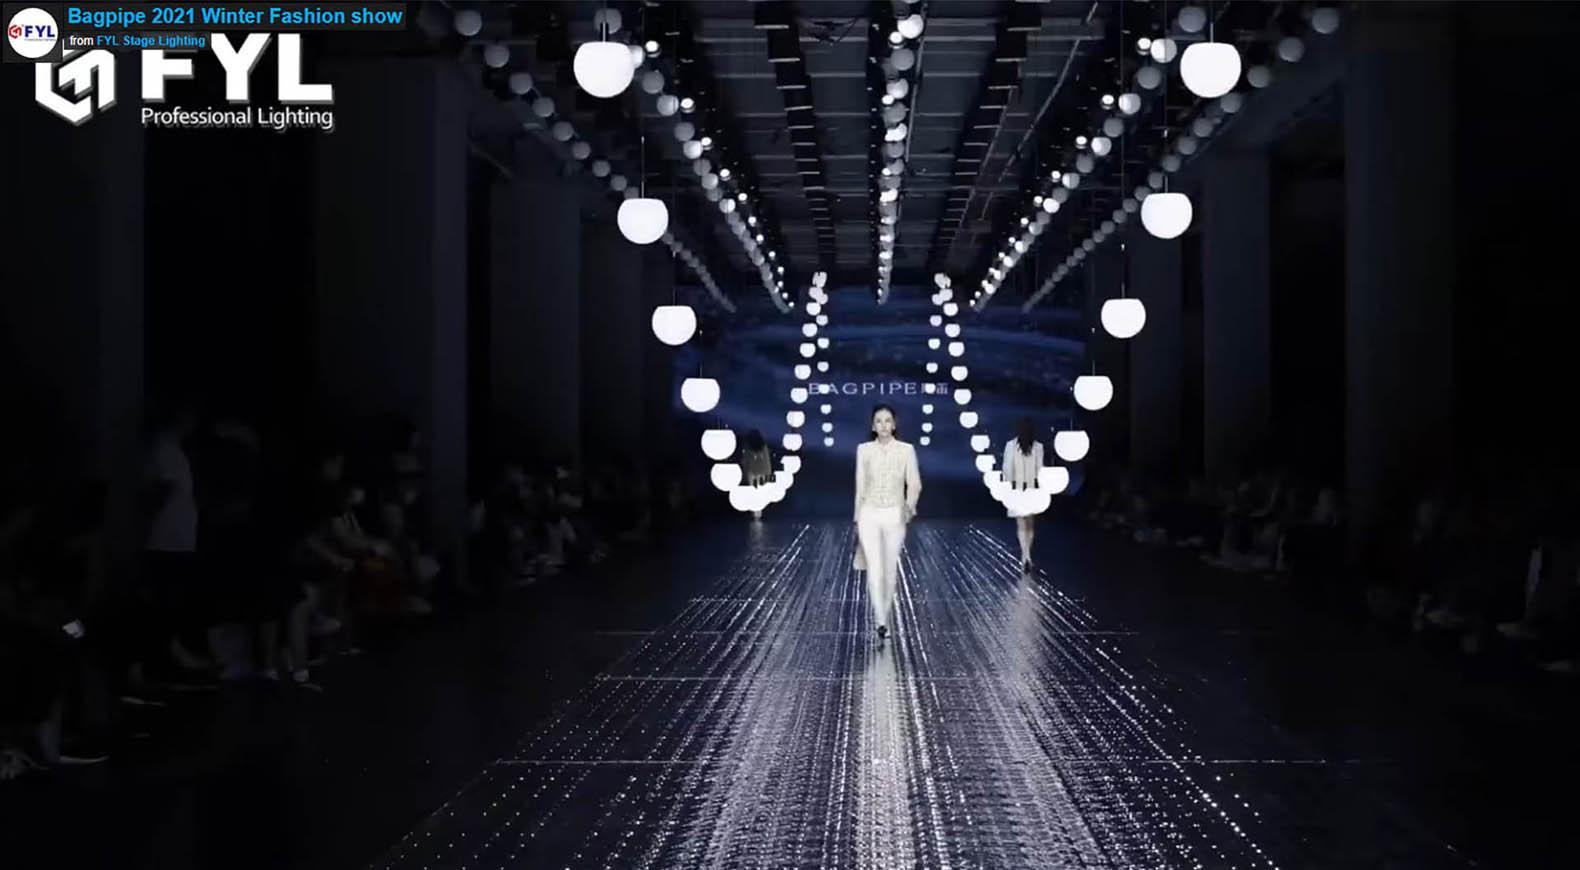 Bagpipe 2021 Winter Fashion show